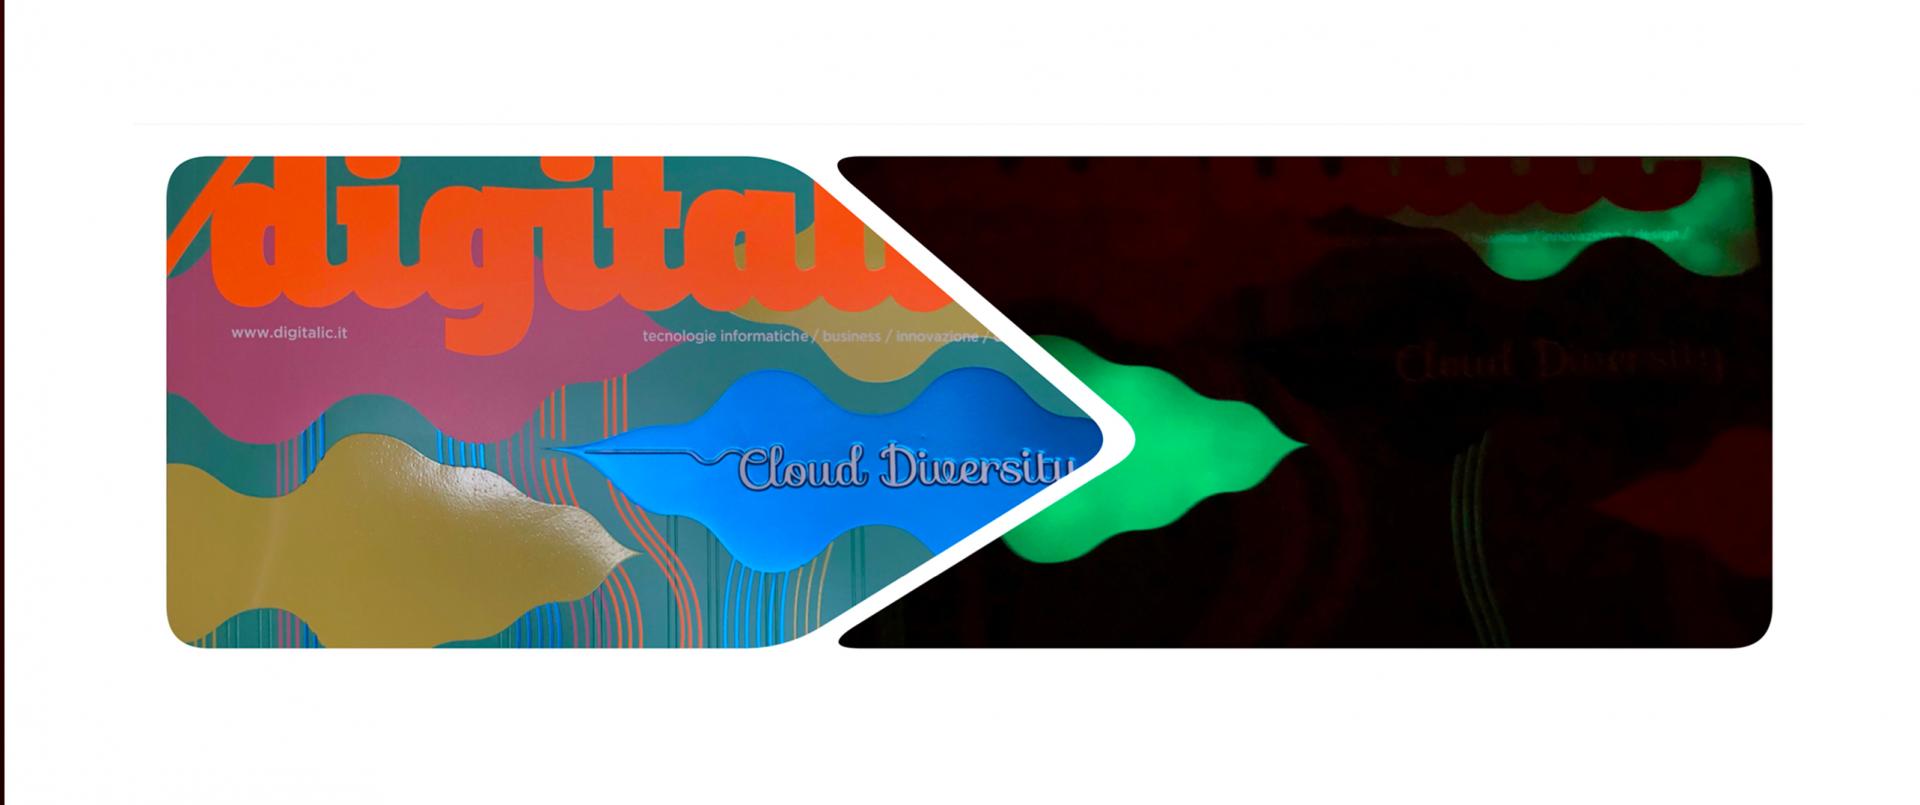 Digitalic n. 72 – Cloud Diversity